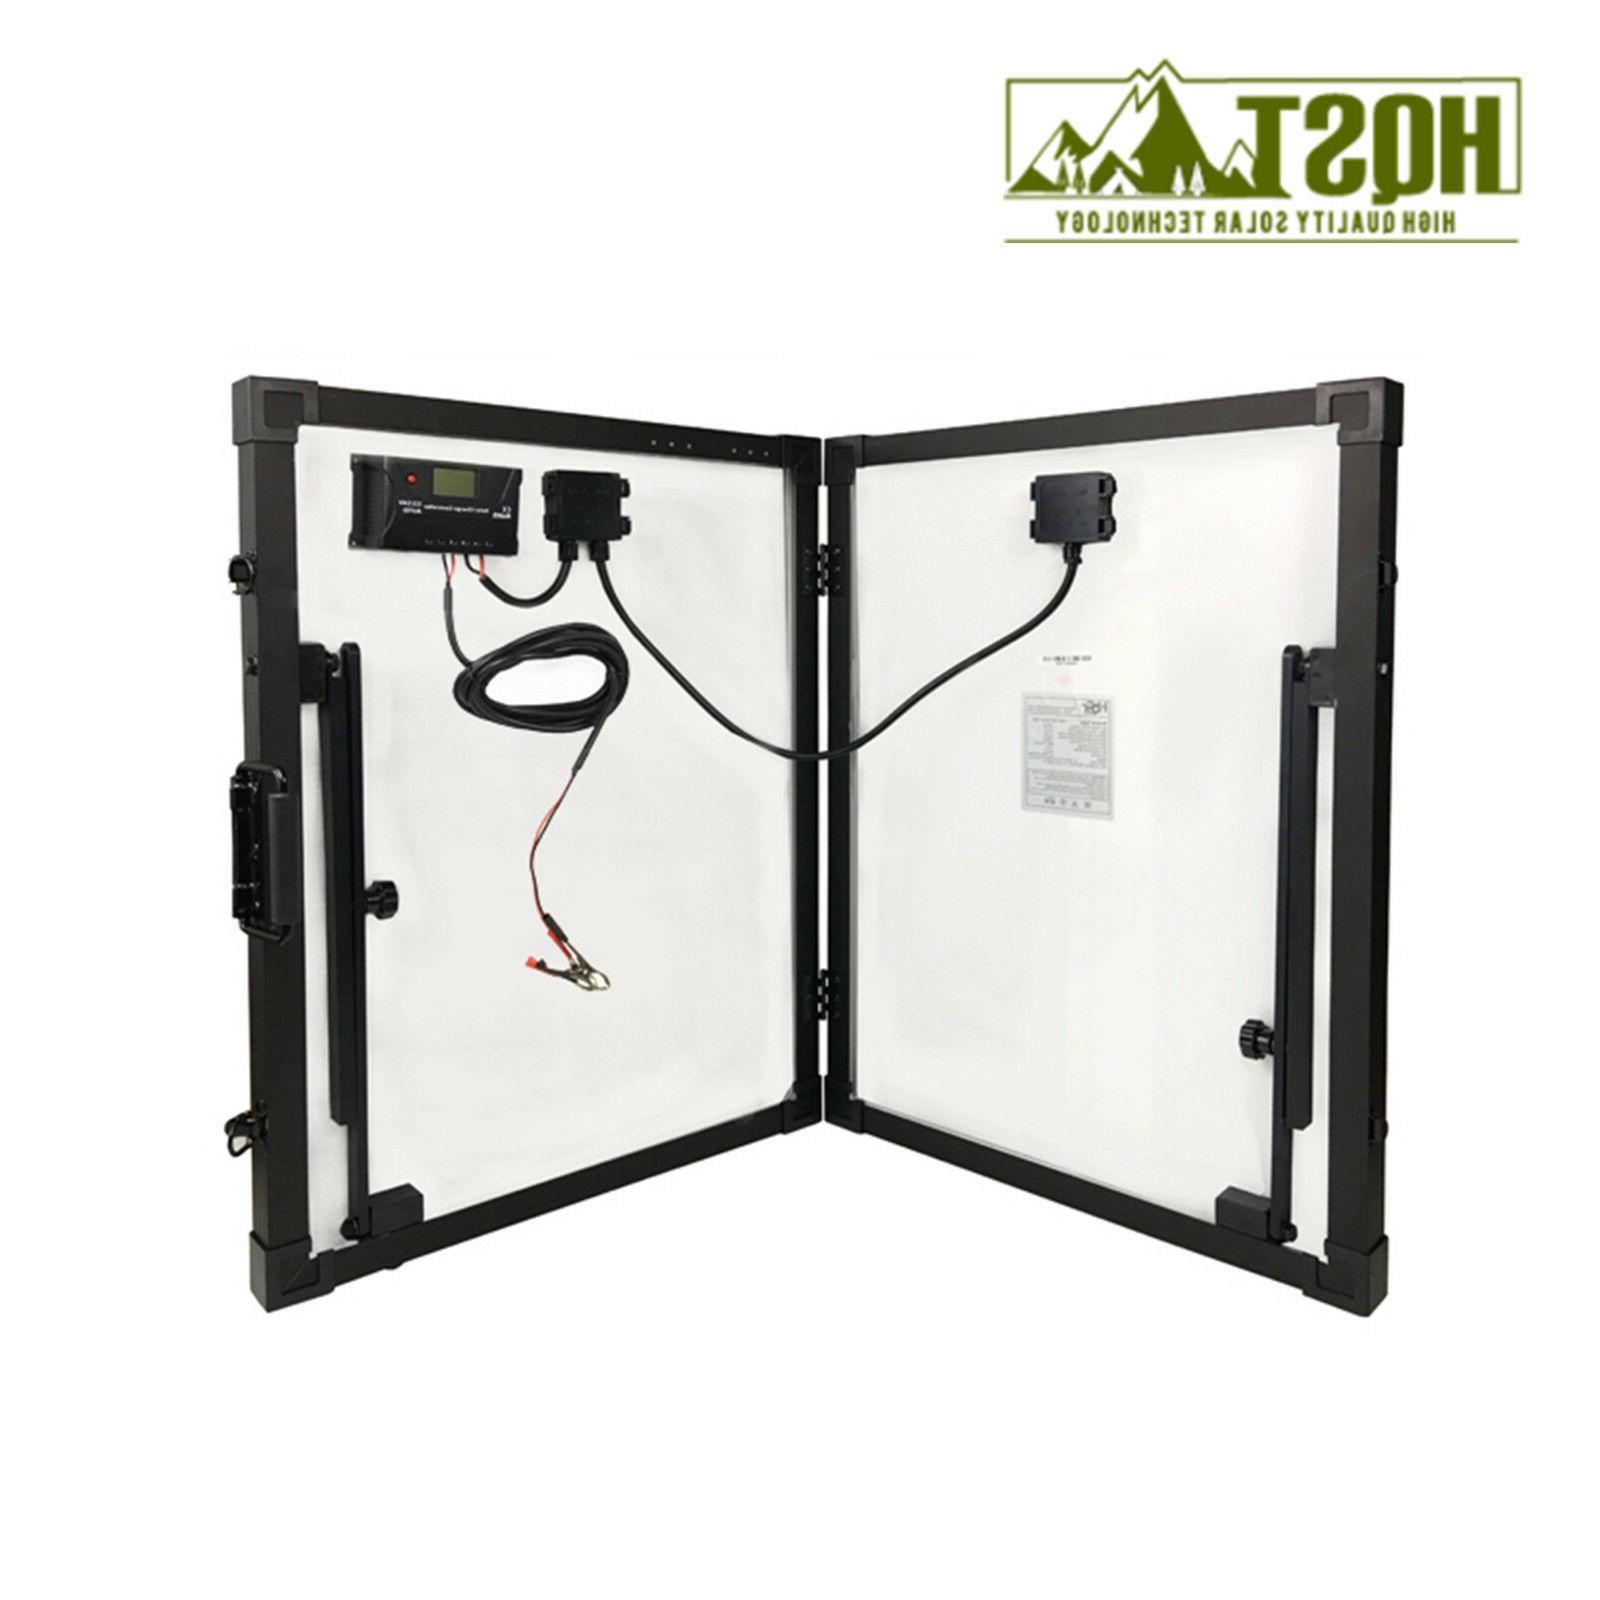 Solar Suitcase w/ Portable Solar